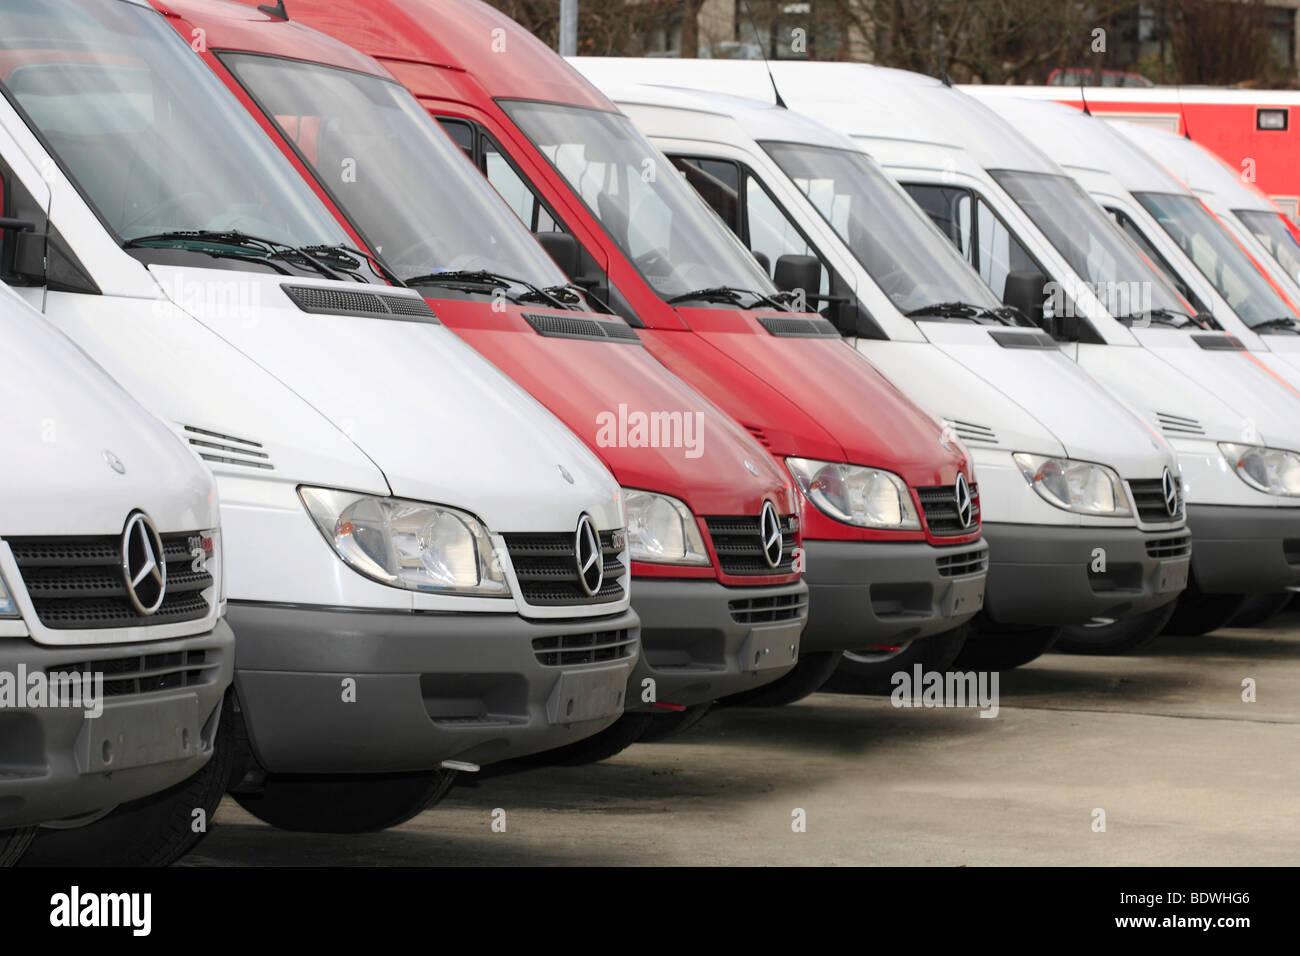 Vans for sale - Stock Image